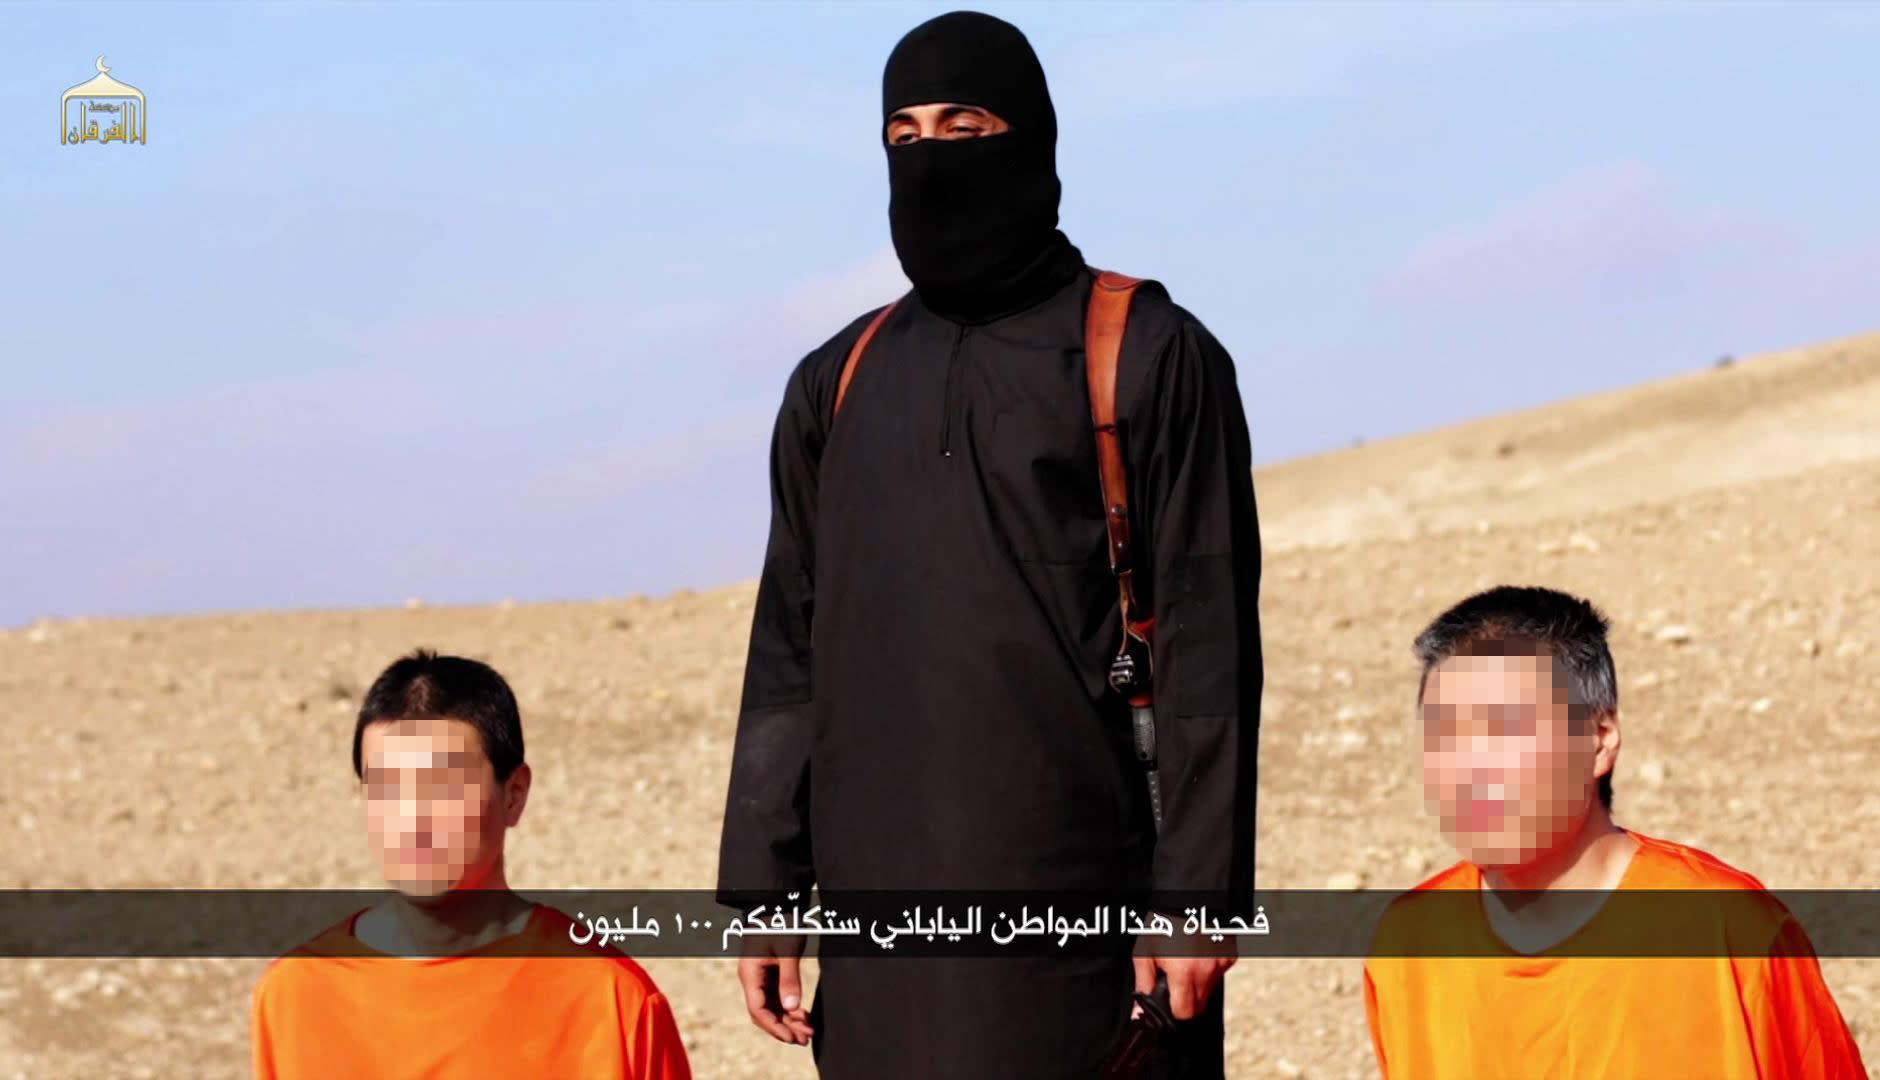 IS confirms execution of Japanese hostage Haruna Yukawa